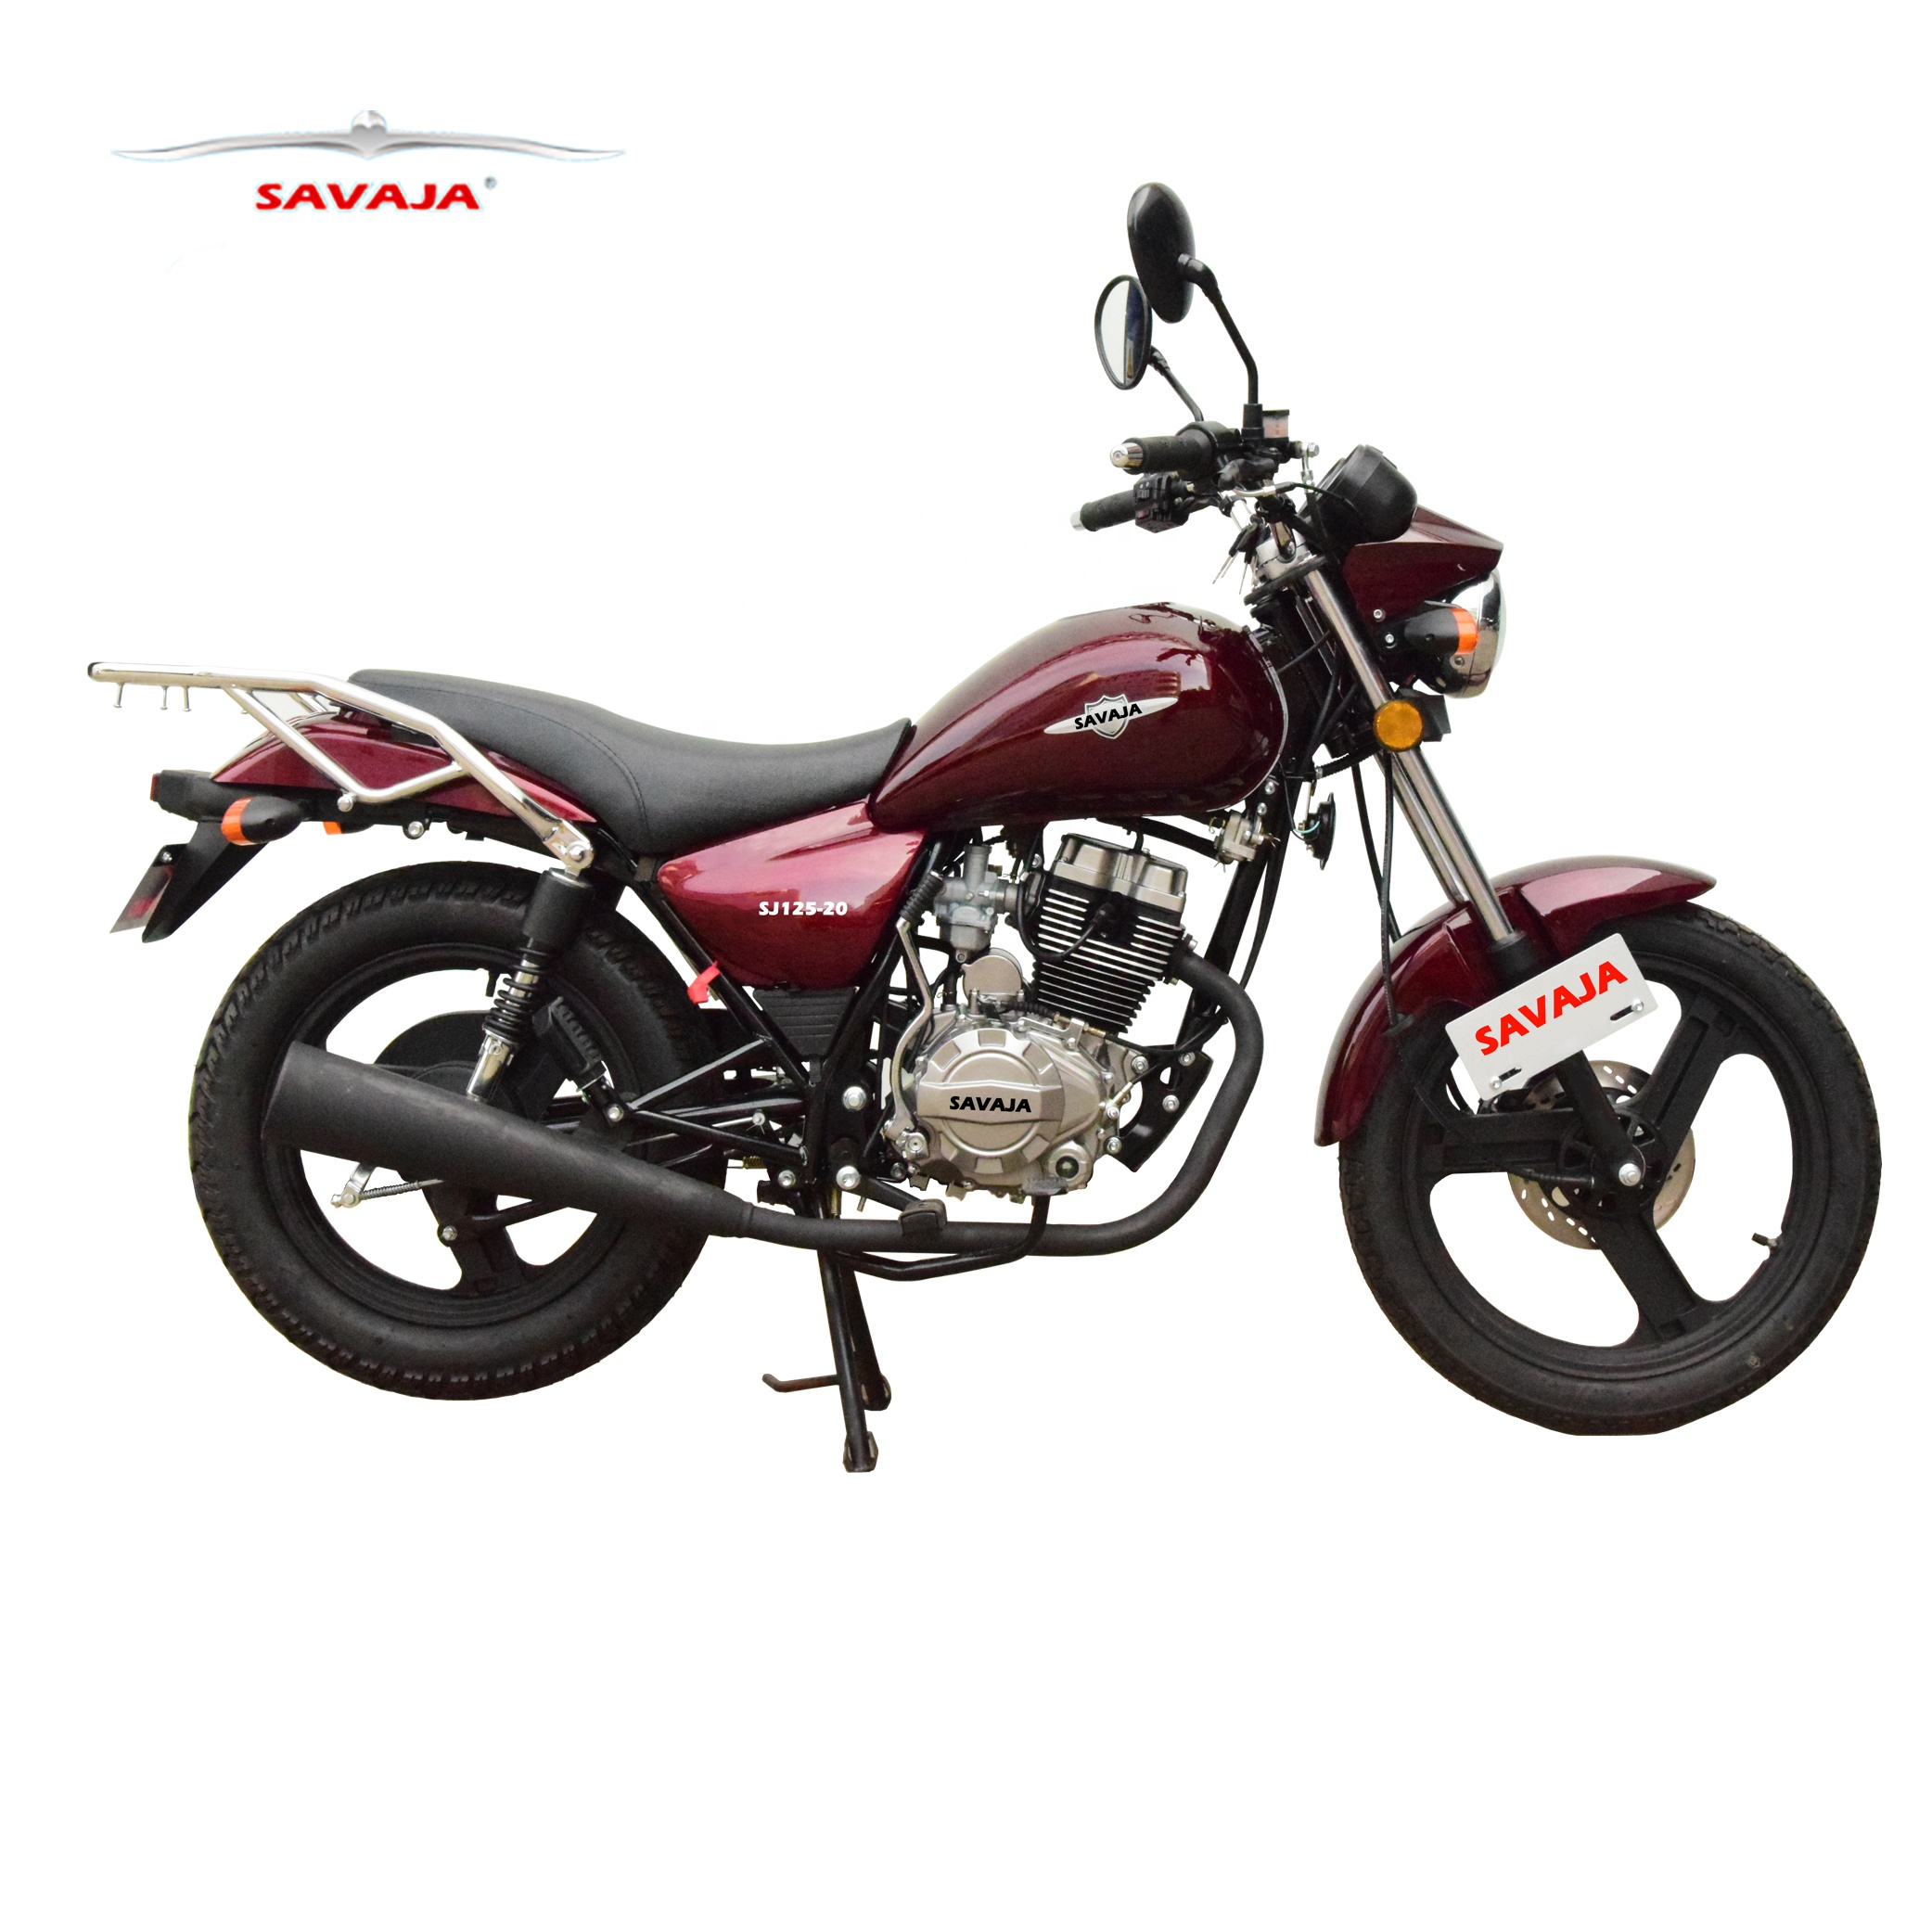 Haojin Apsonic Royal Sanili Fekon Dayun Haojue Hj125-20 Gn125 150cc Motorcycle Savaja Sj125-20 Gn001 - Buy Gn,125cc,Hj125-20 Product on Alibaba.com